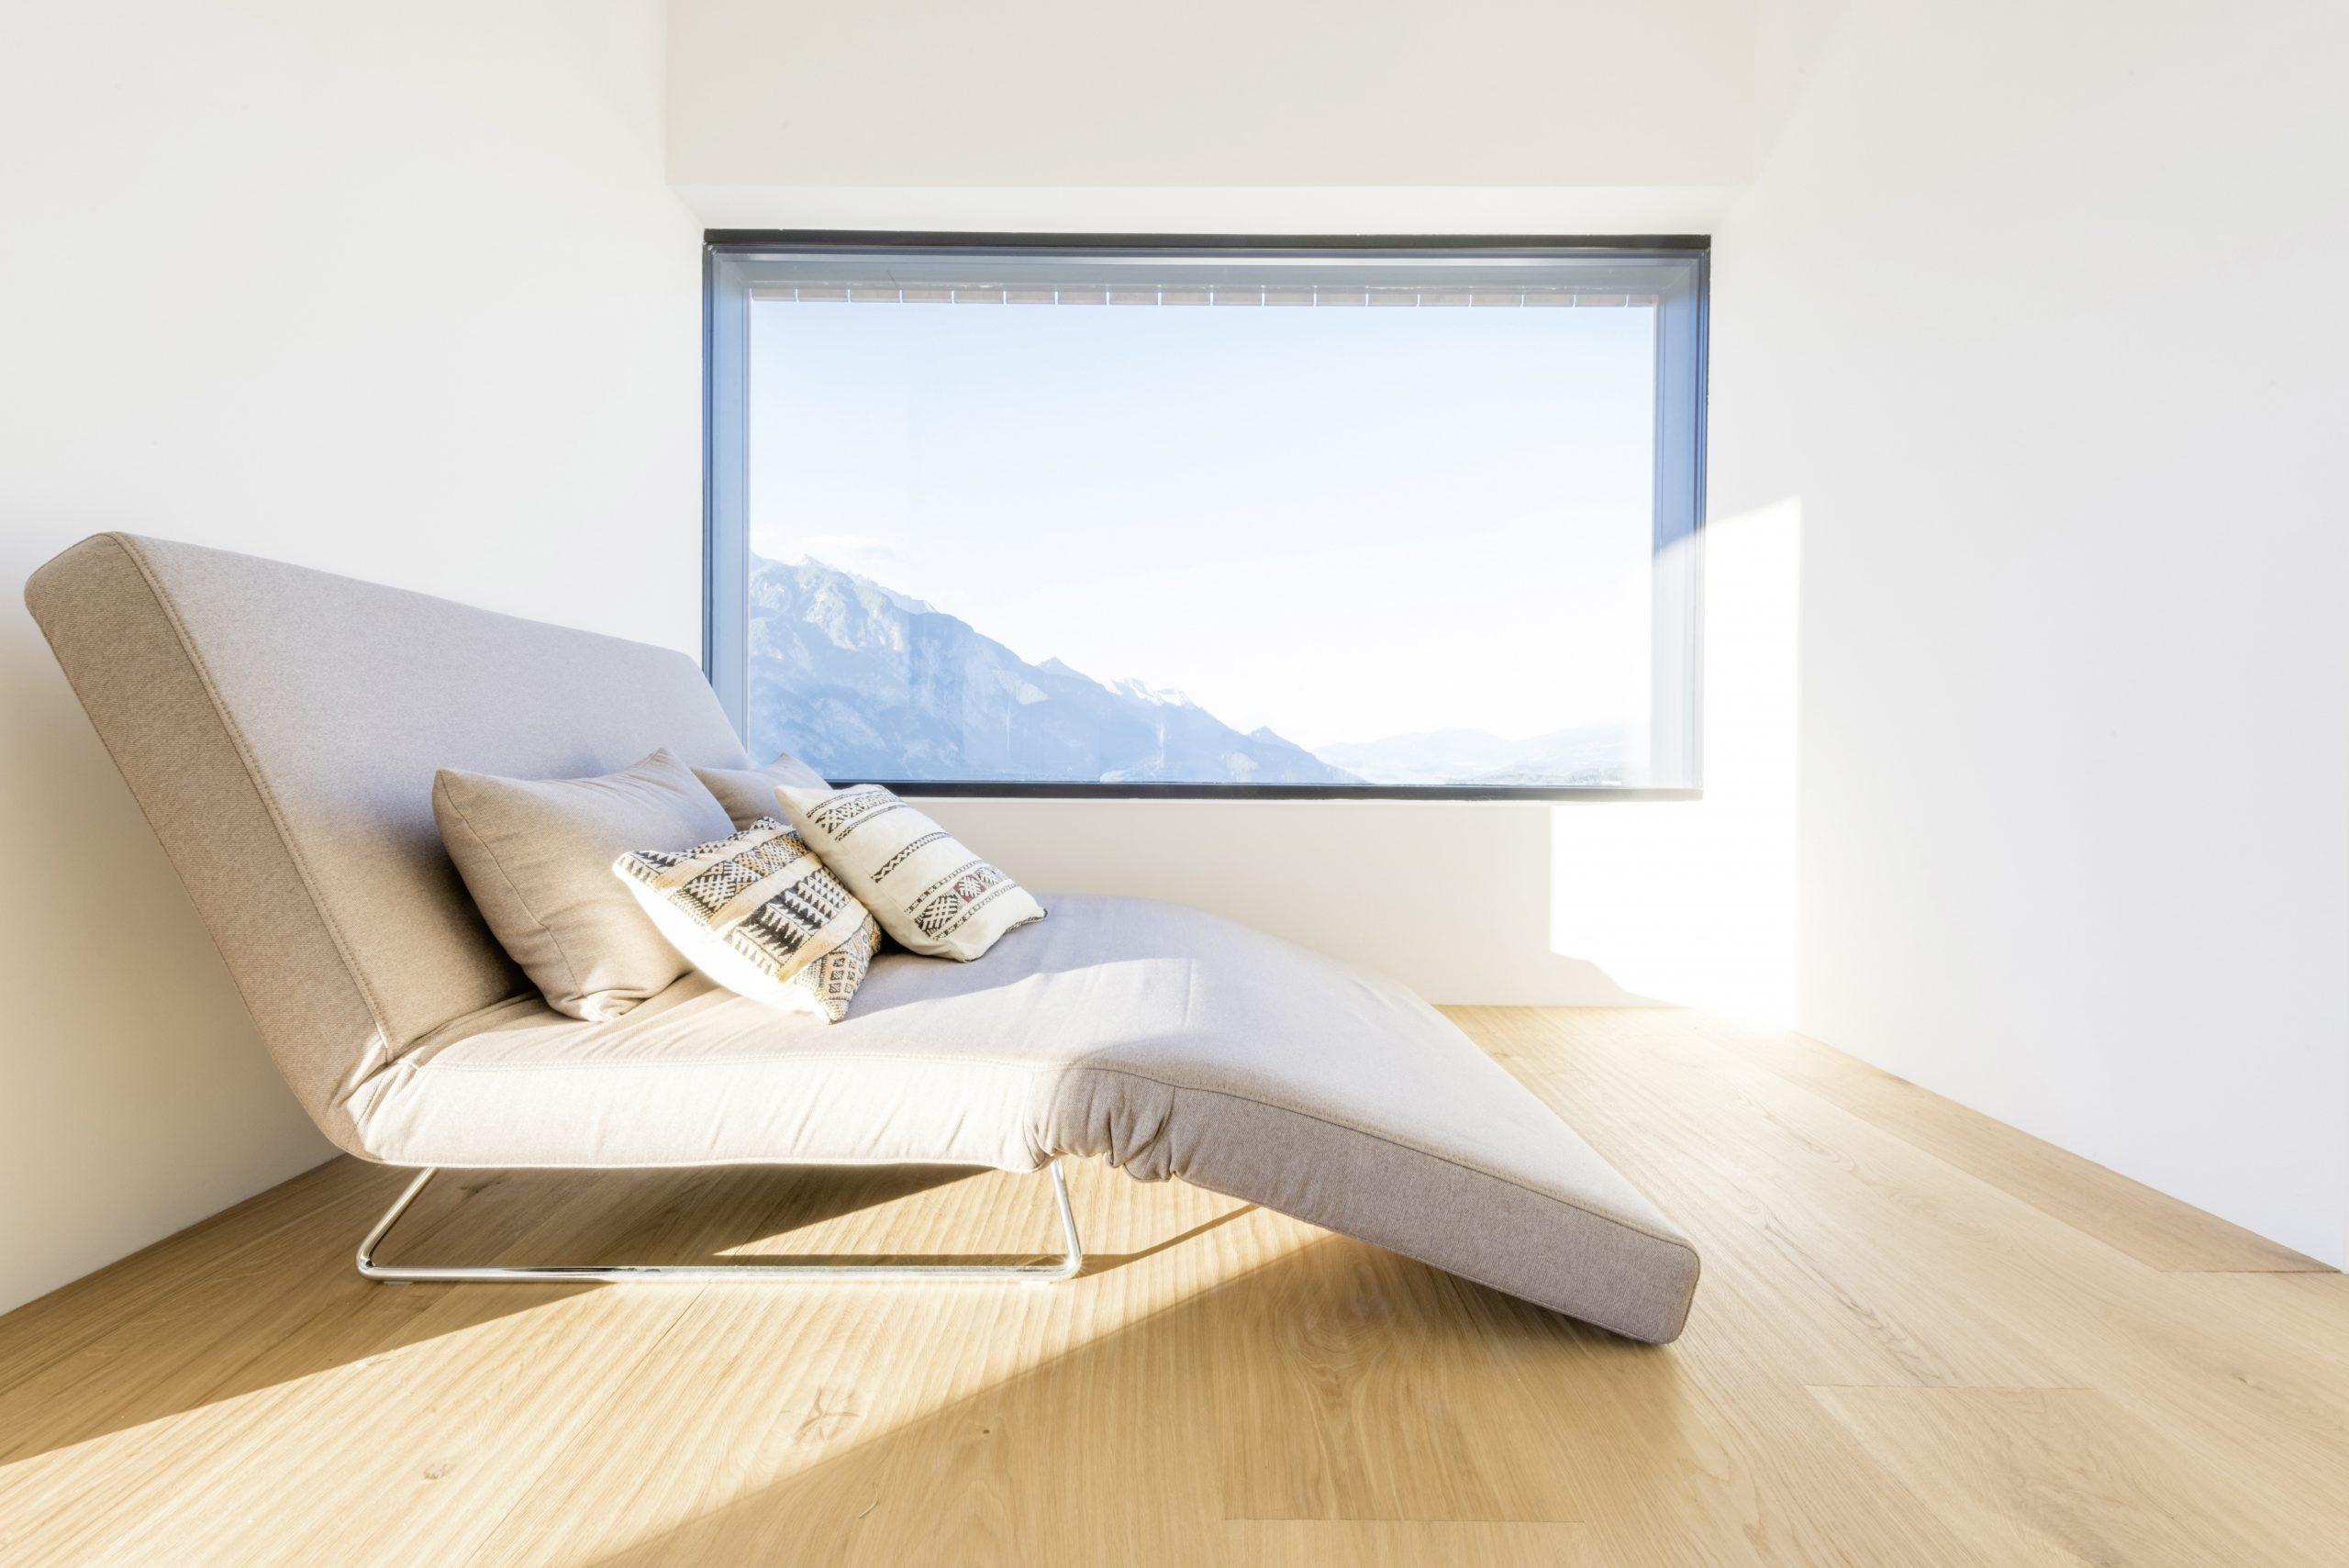 upvc aluminium internorm windows st albans